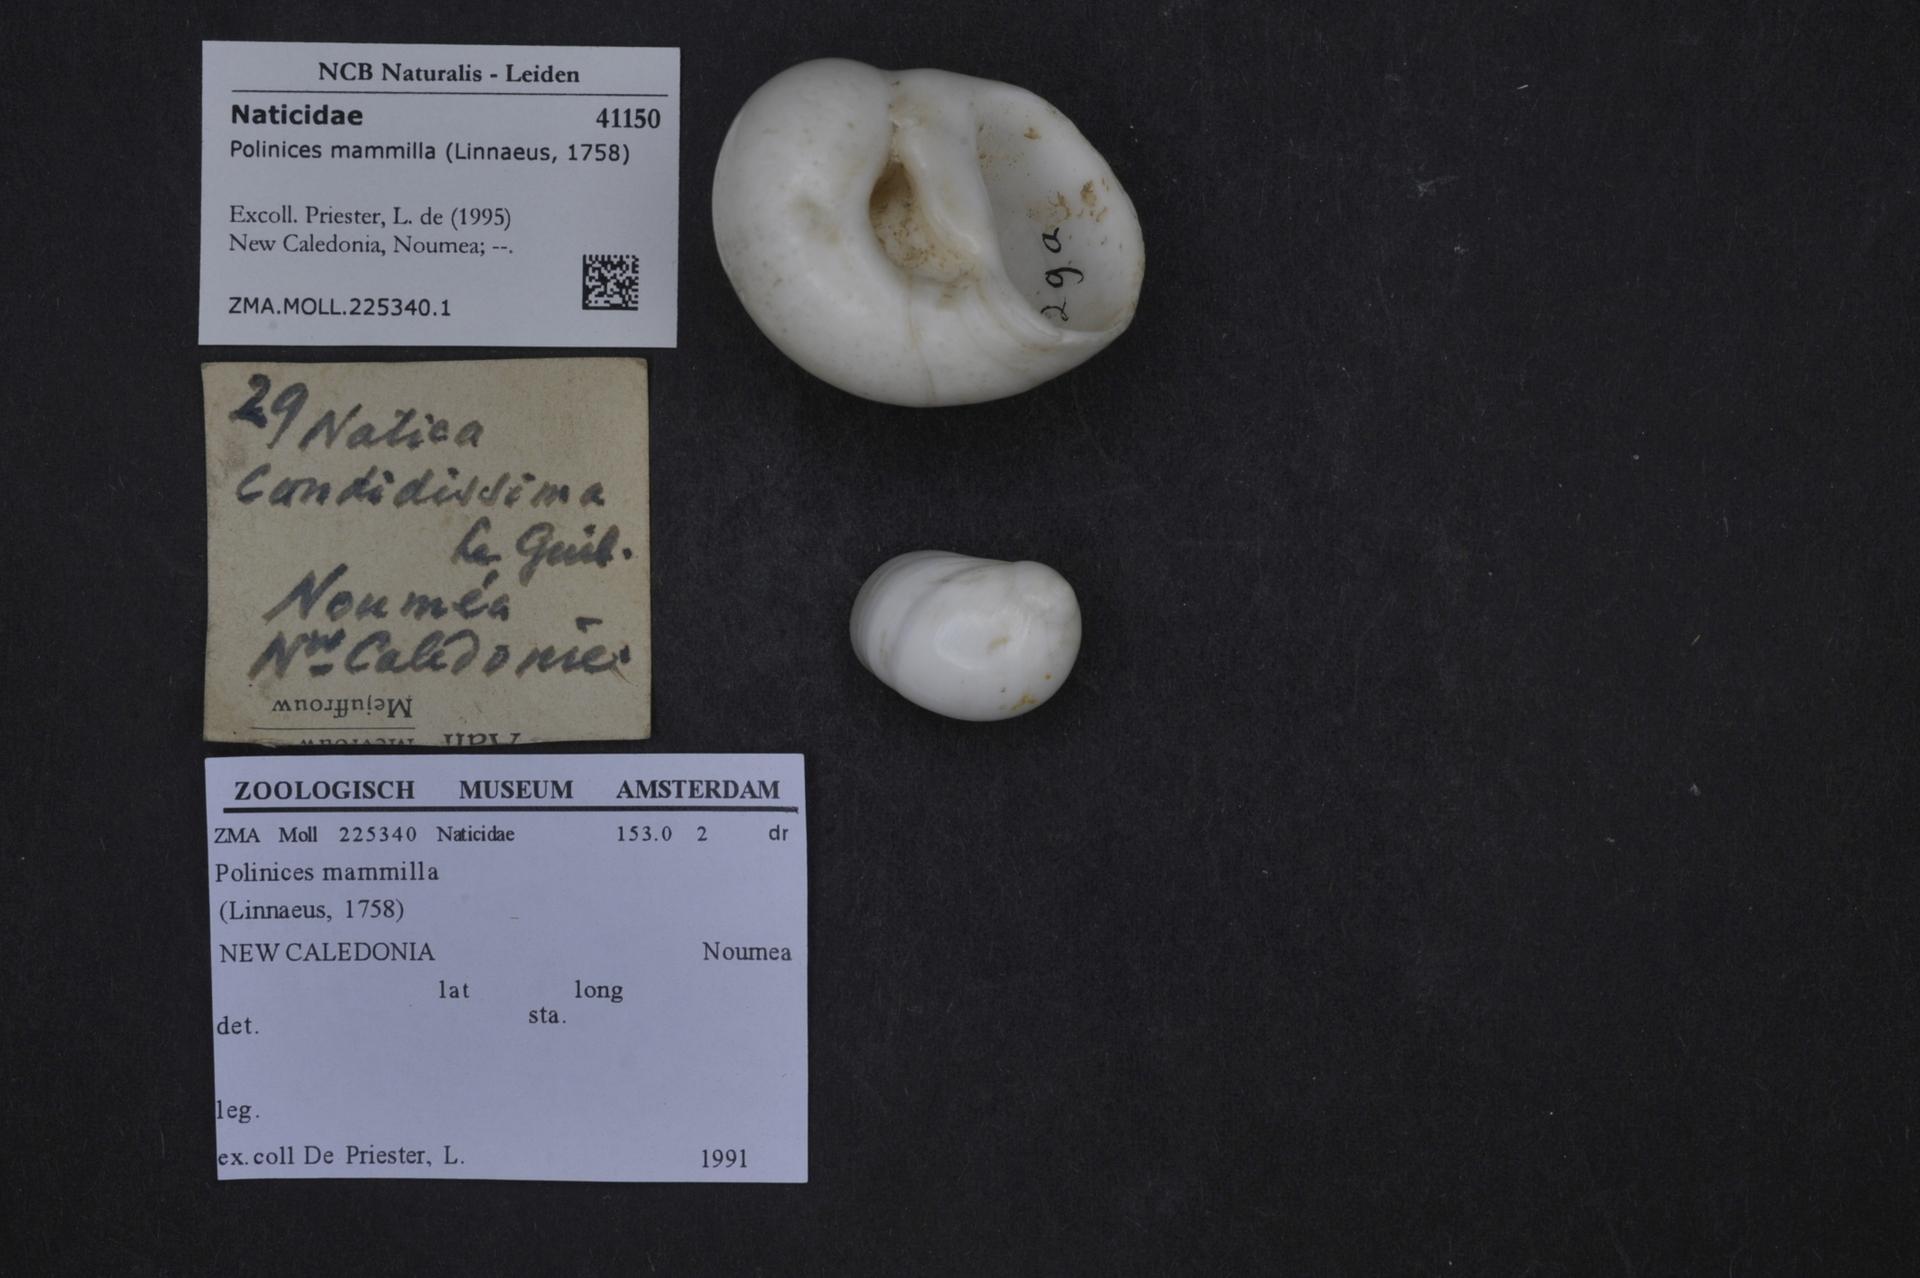 ZMA.MOLL.225340.1 | Polinices mammilla (Linnaeus, 1758)